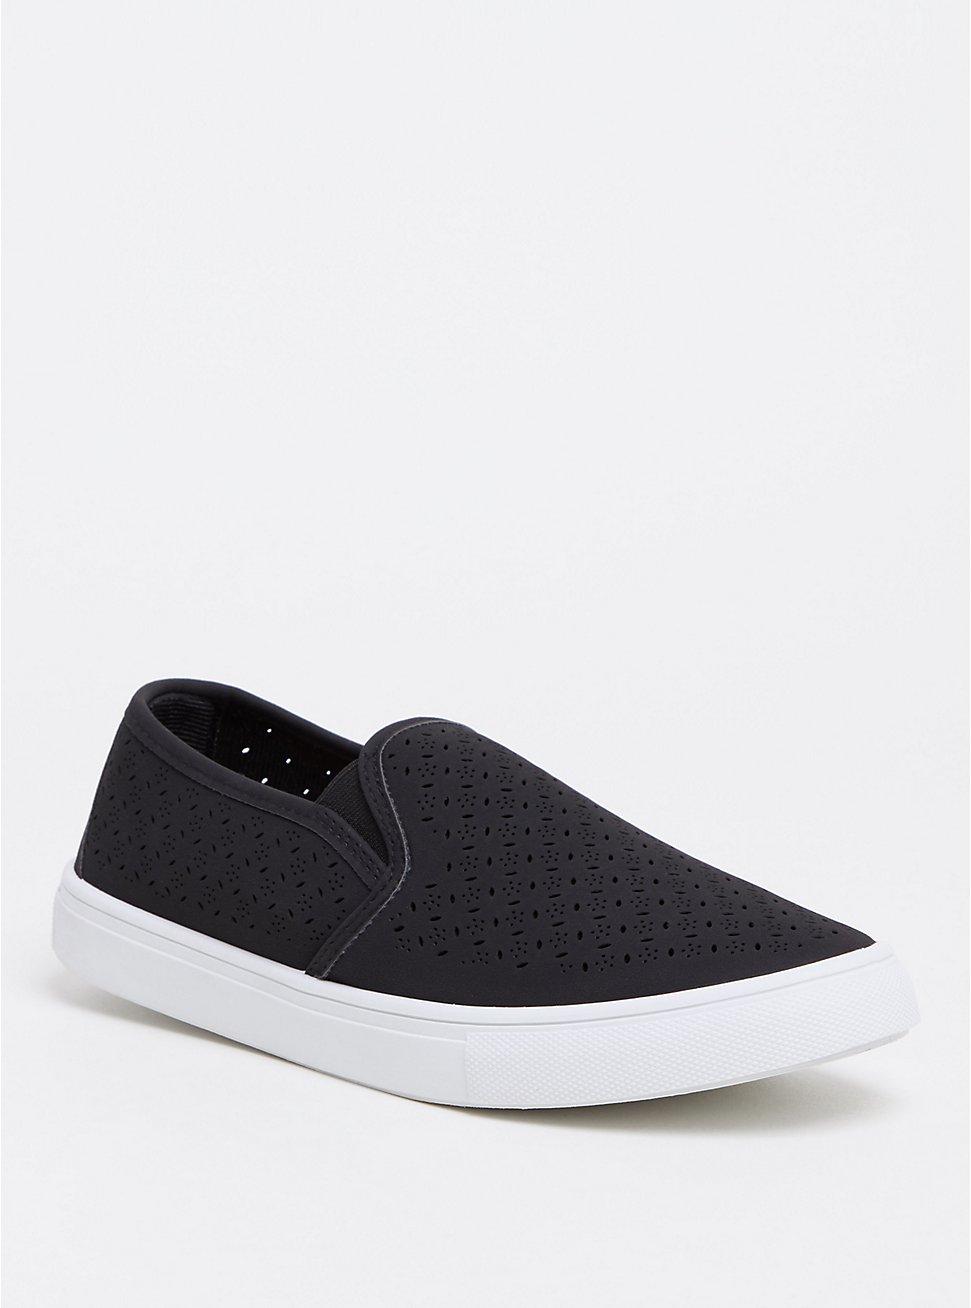 Black Slip-On Faux Suede Laser Cut Sneaker (WW), BLACK, hi-res